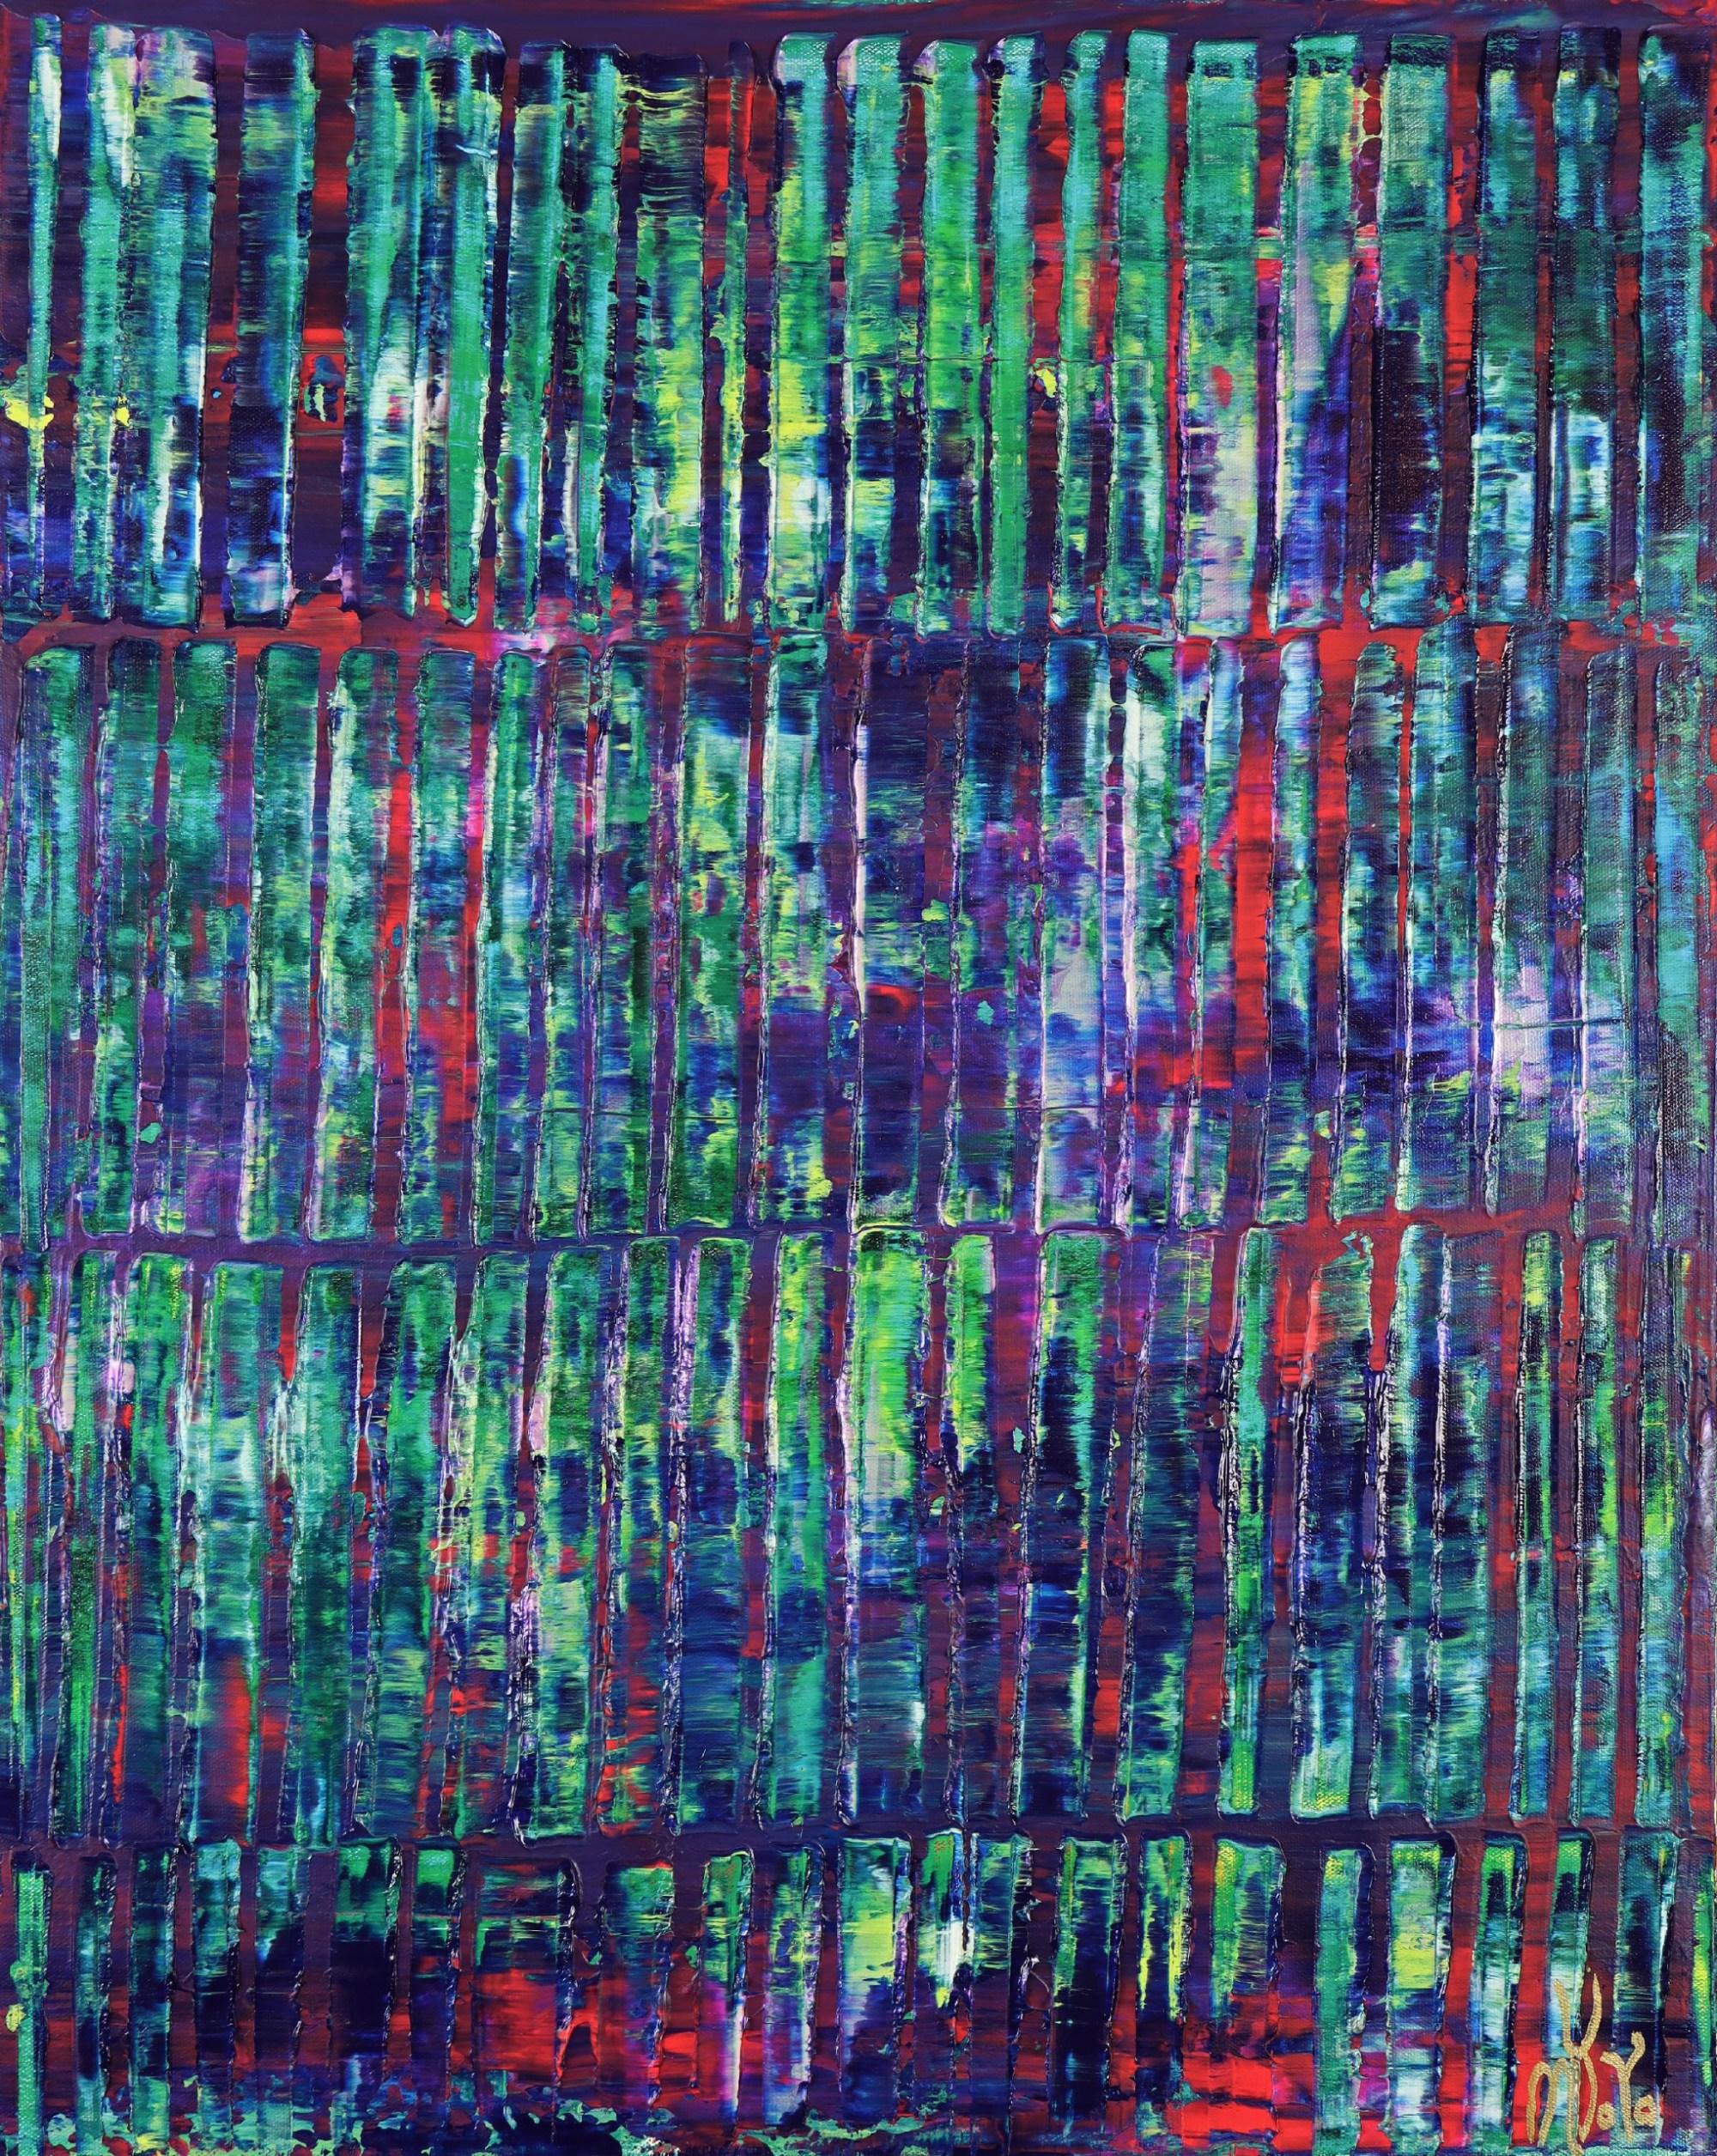 Iridescent Green Forest (2021) / Full canvas / Artist: Nestor Toro